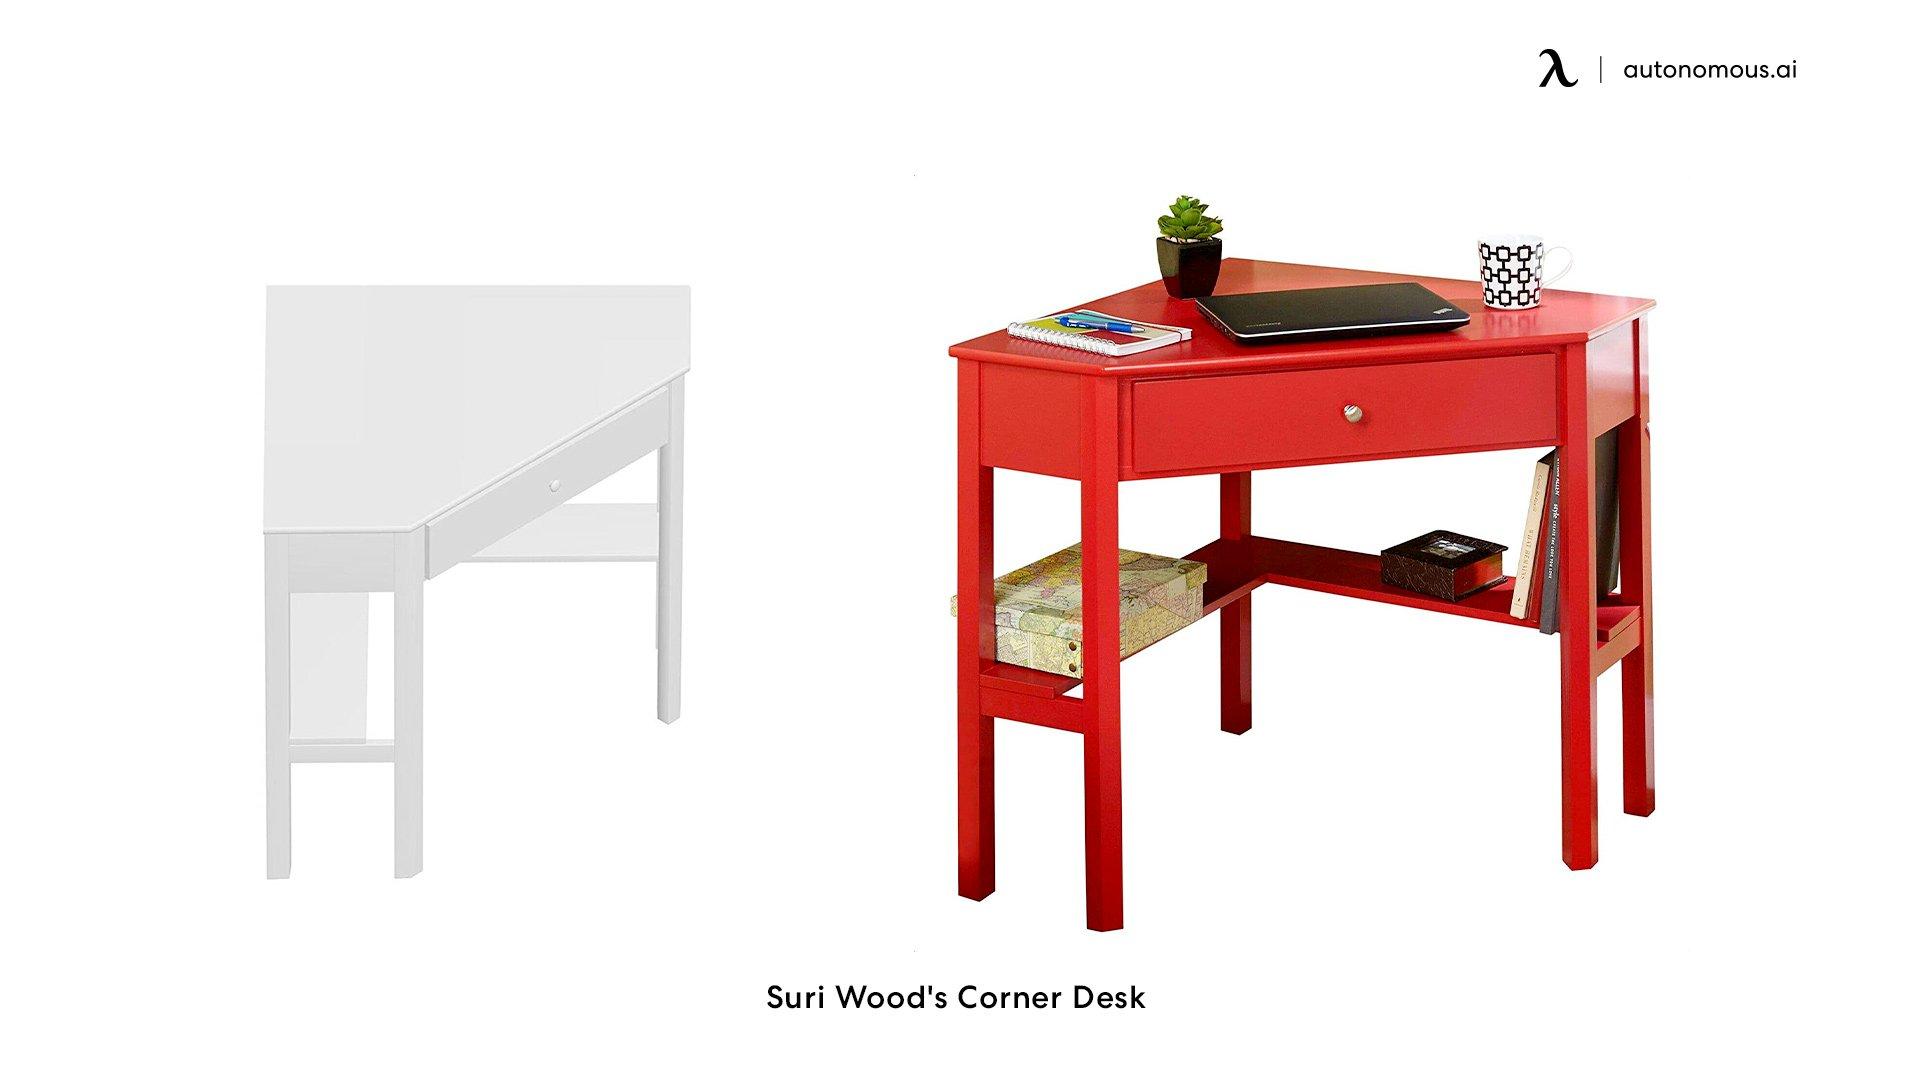 Suri Wood's Corner Desk